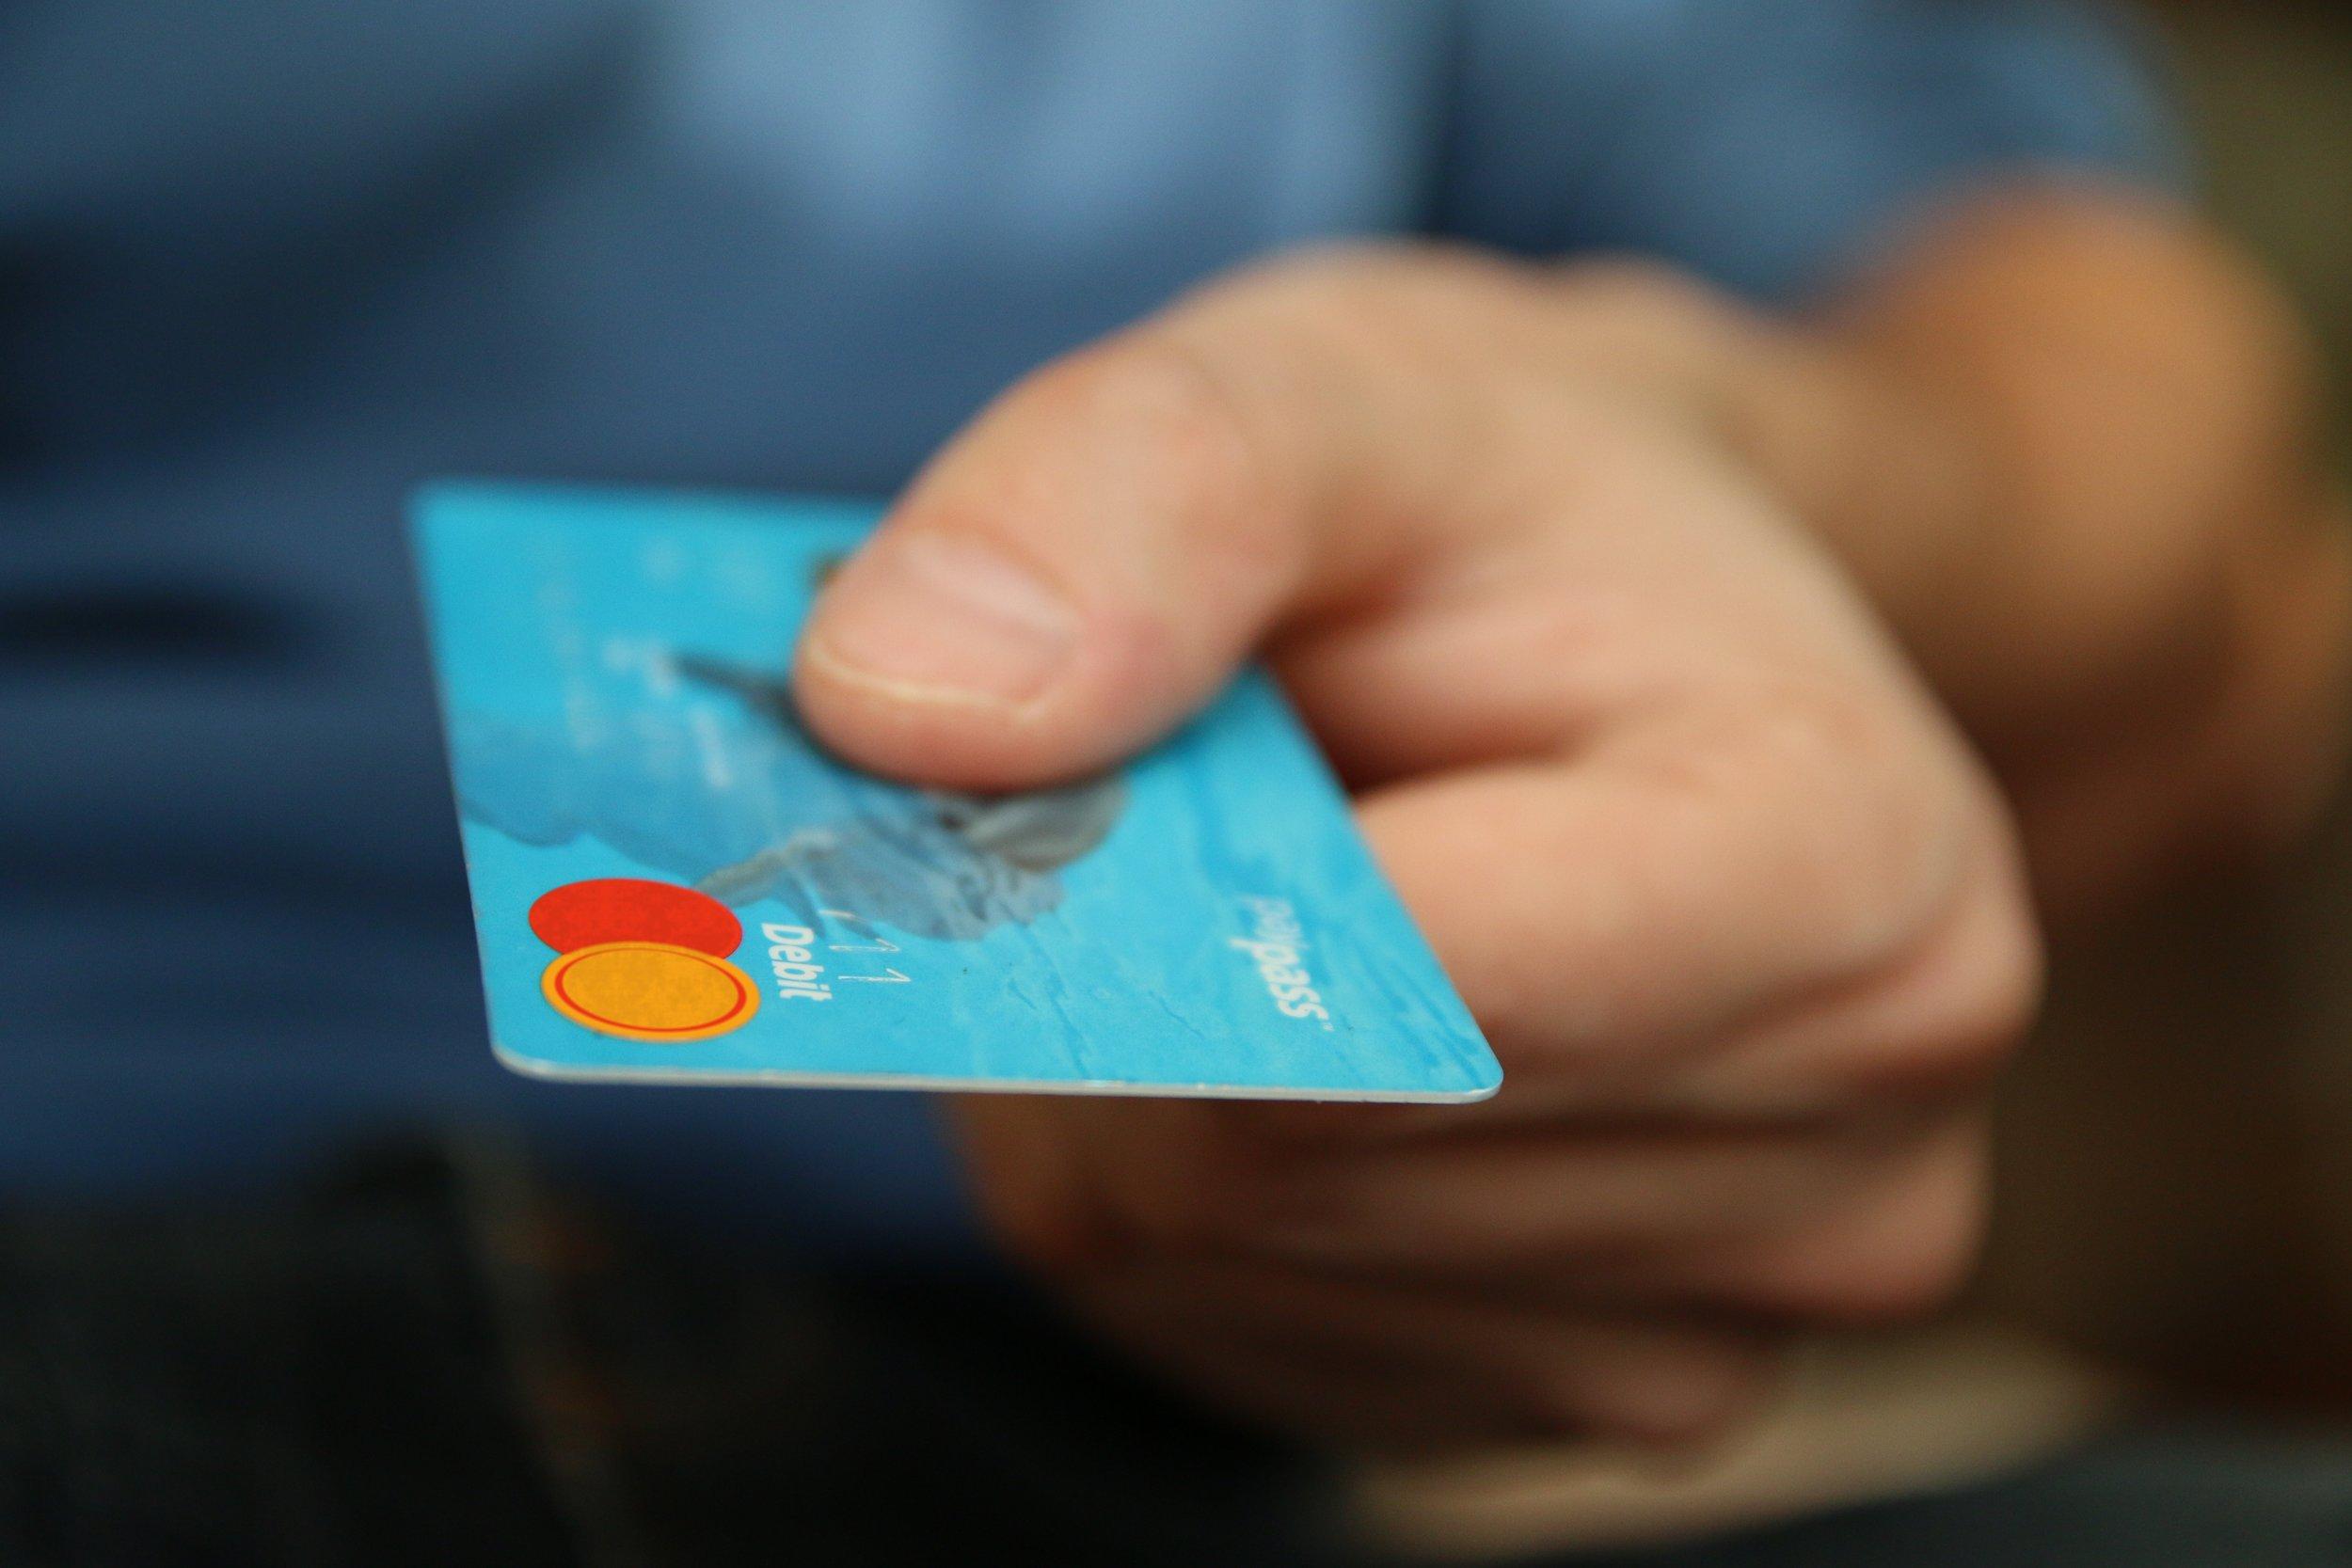 paymentpic.jpg